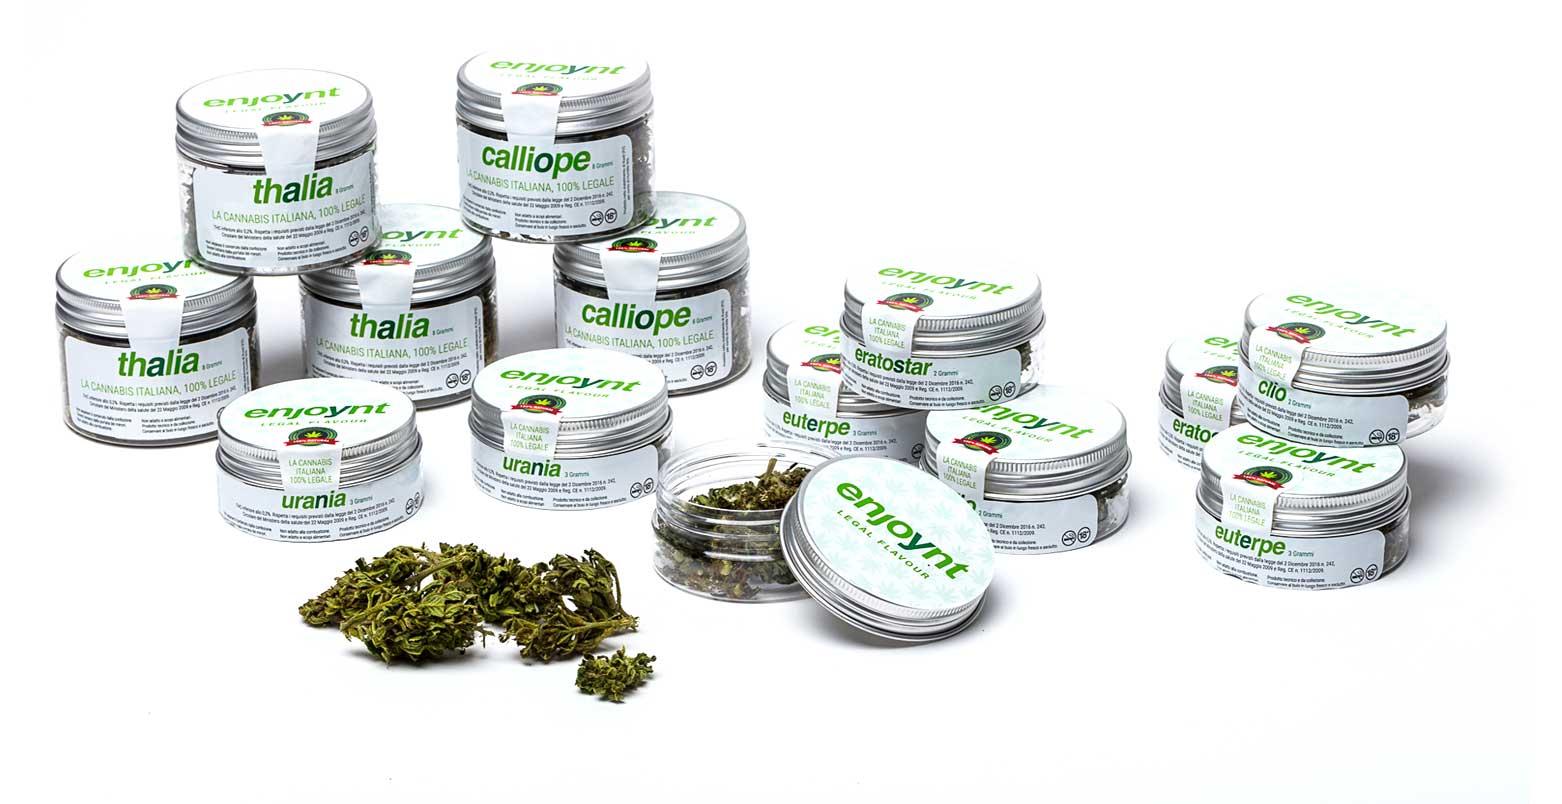 Linea completa cannabis light